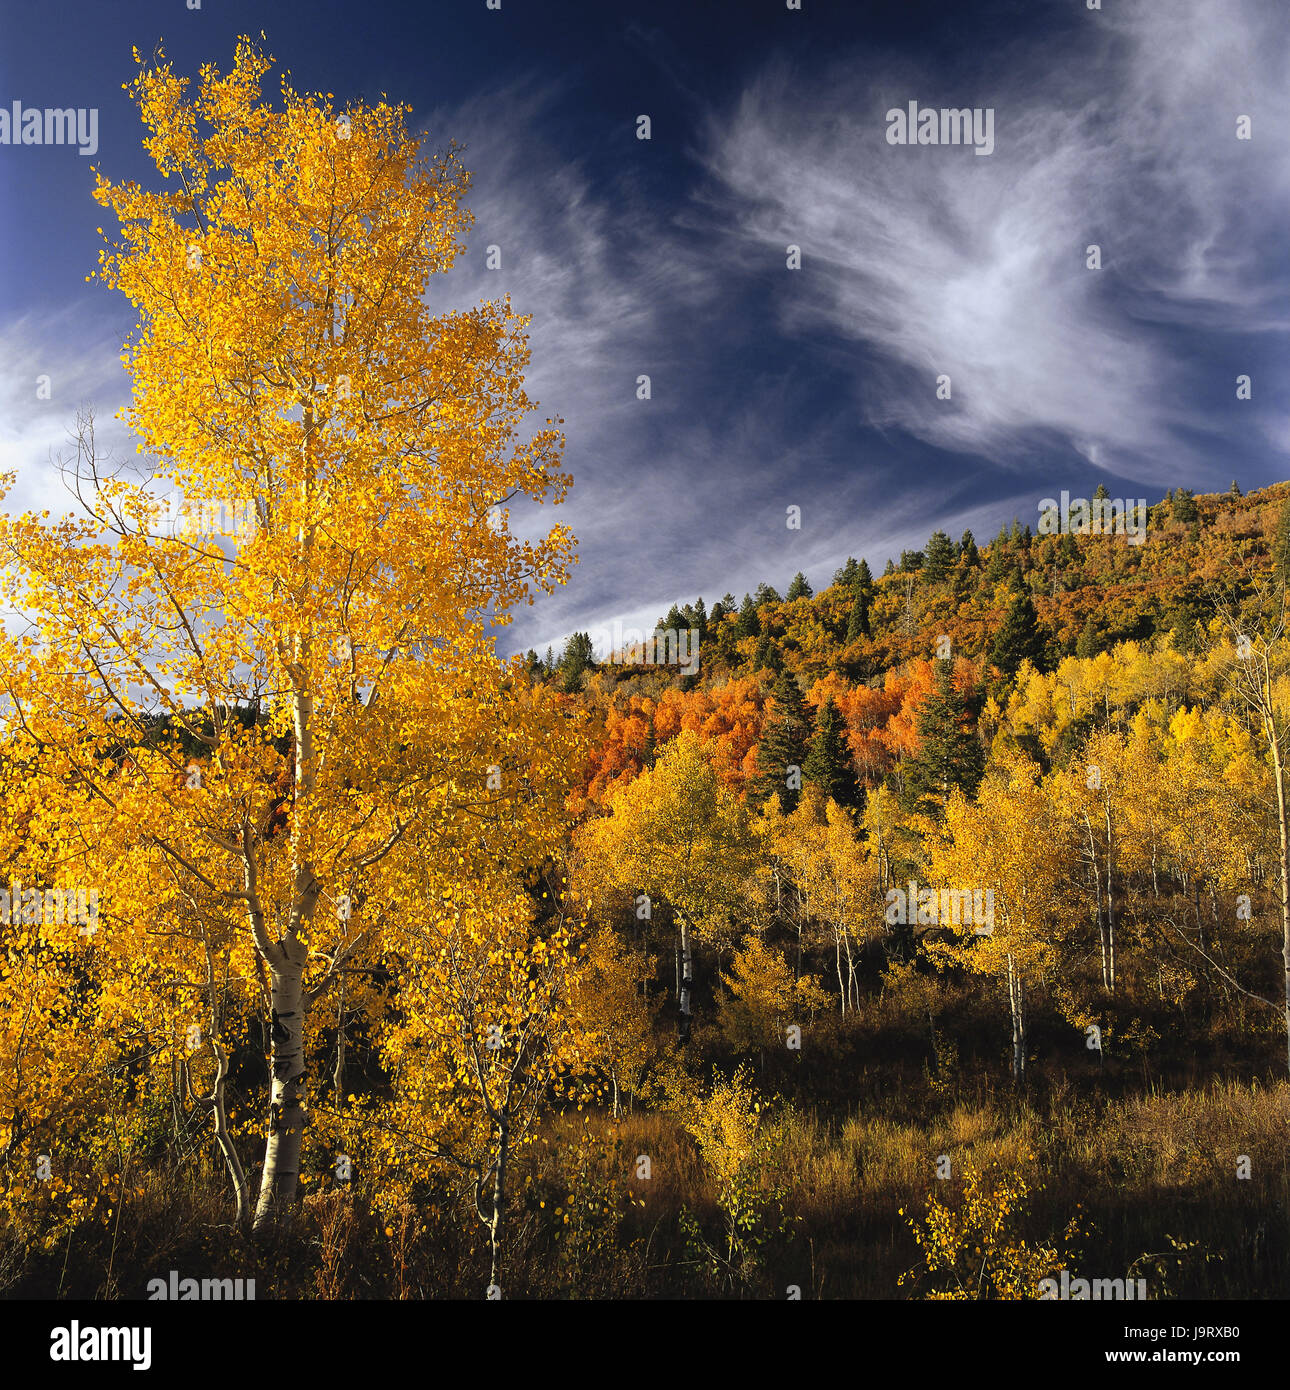 Usa Utah Uinta Mountains Timpanogos Region Holz Baume Herbst